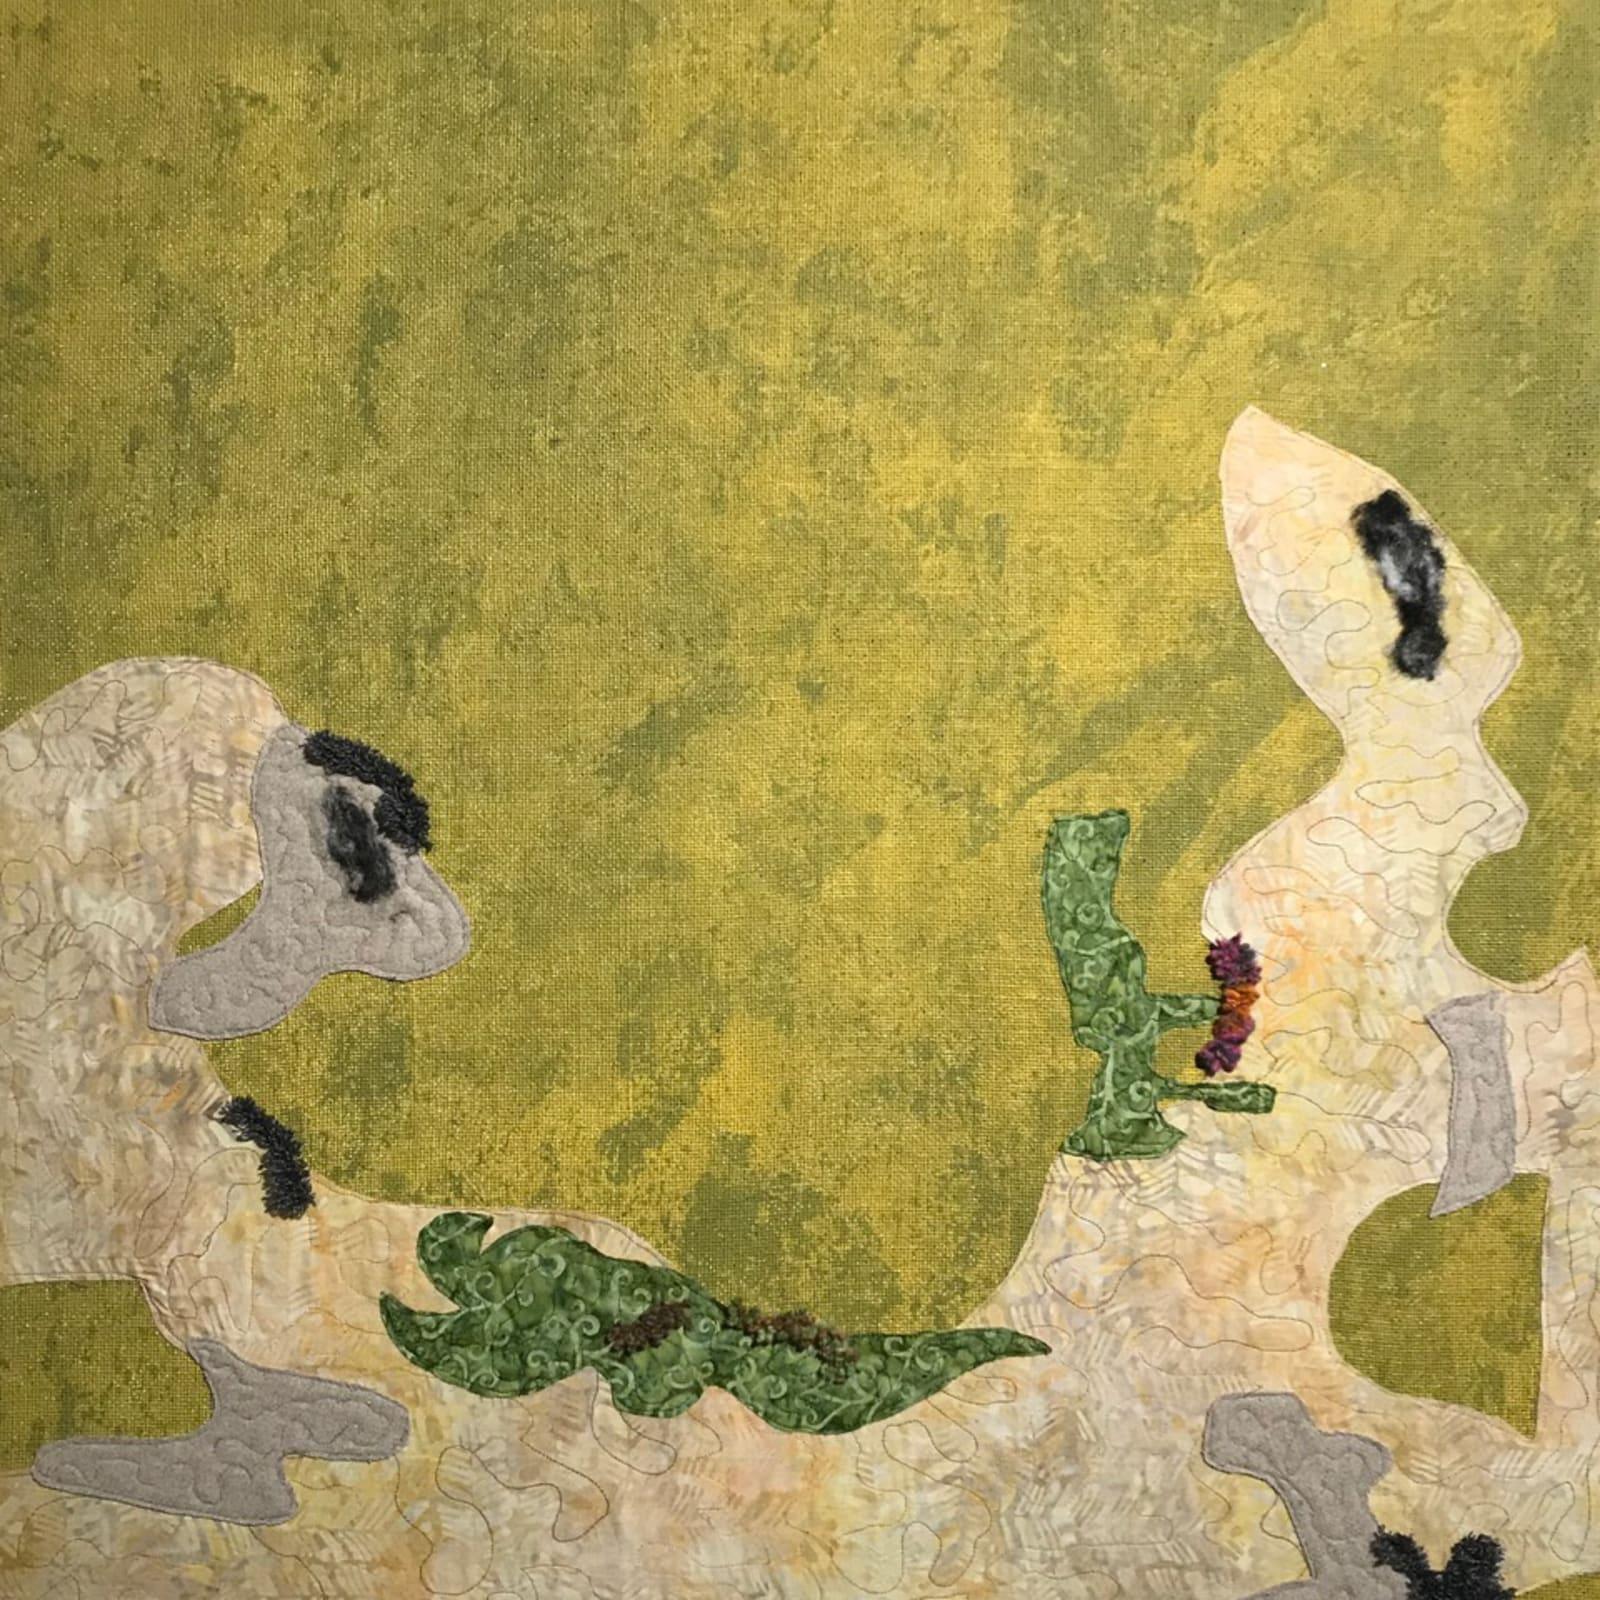 SHEZAD DAWOOD at the The Toronto Biennial of Art | 21 September - 1 December 2019